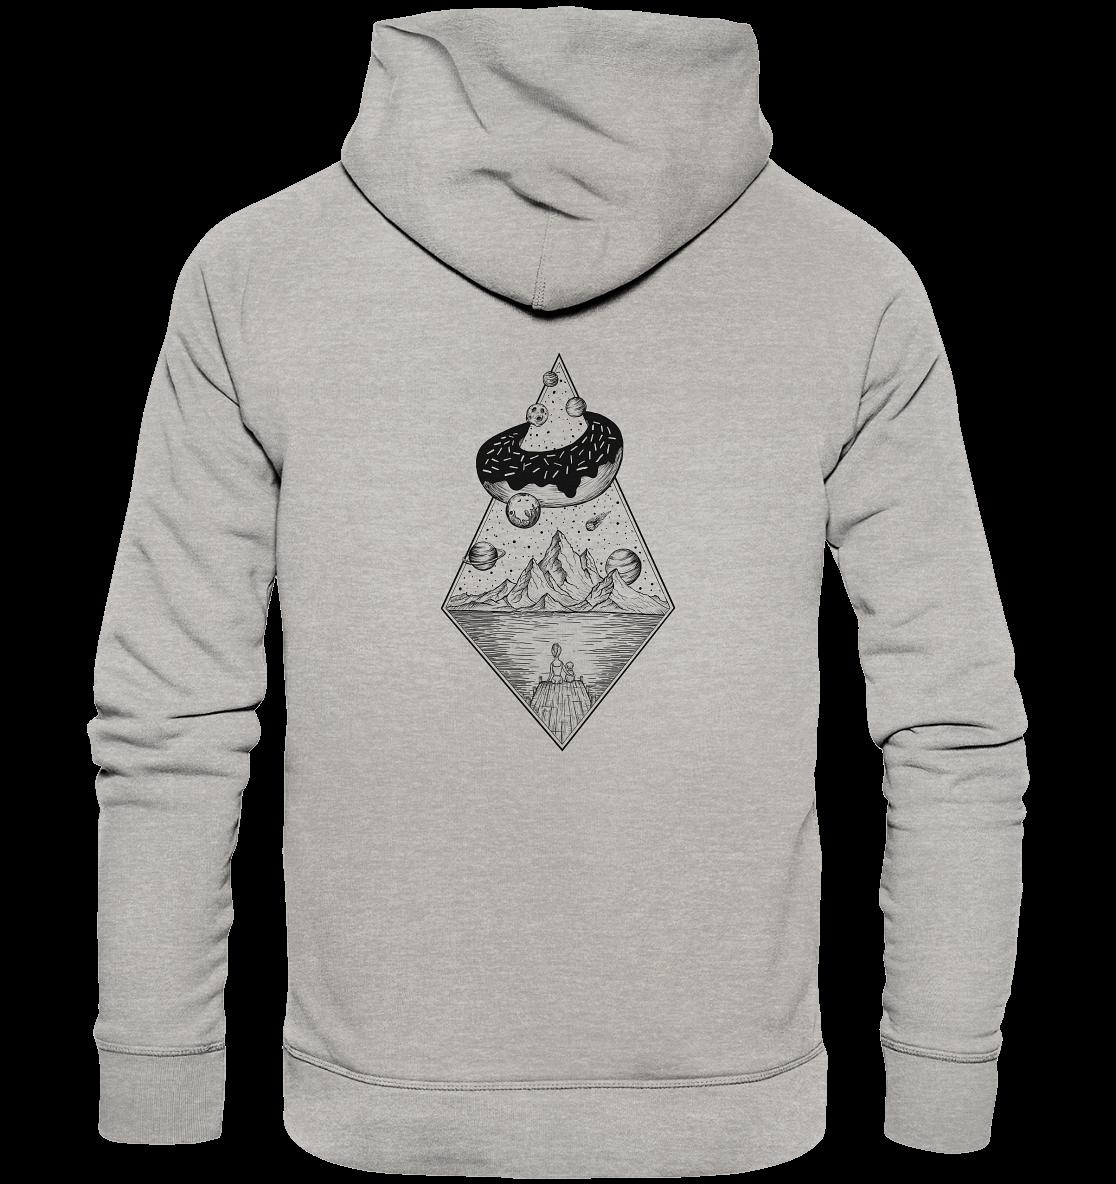 back-organic-fashion-hoodie-c2c1c0-1116x.png